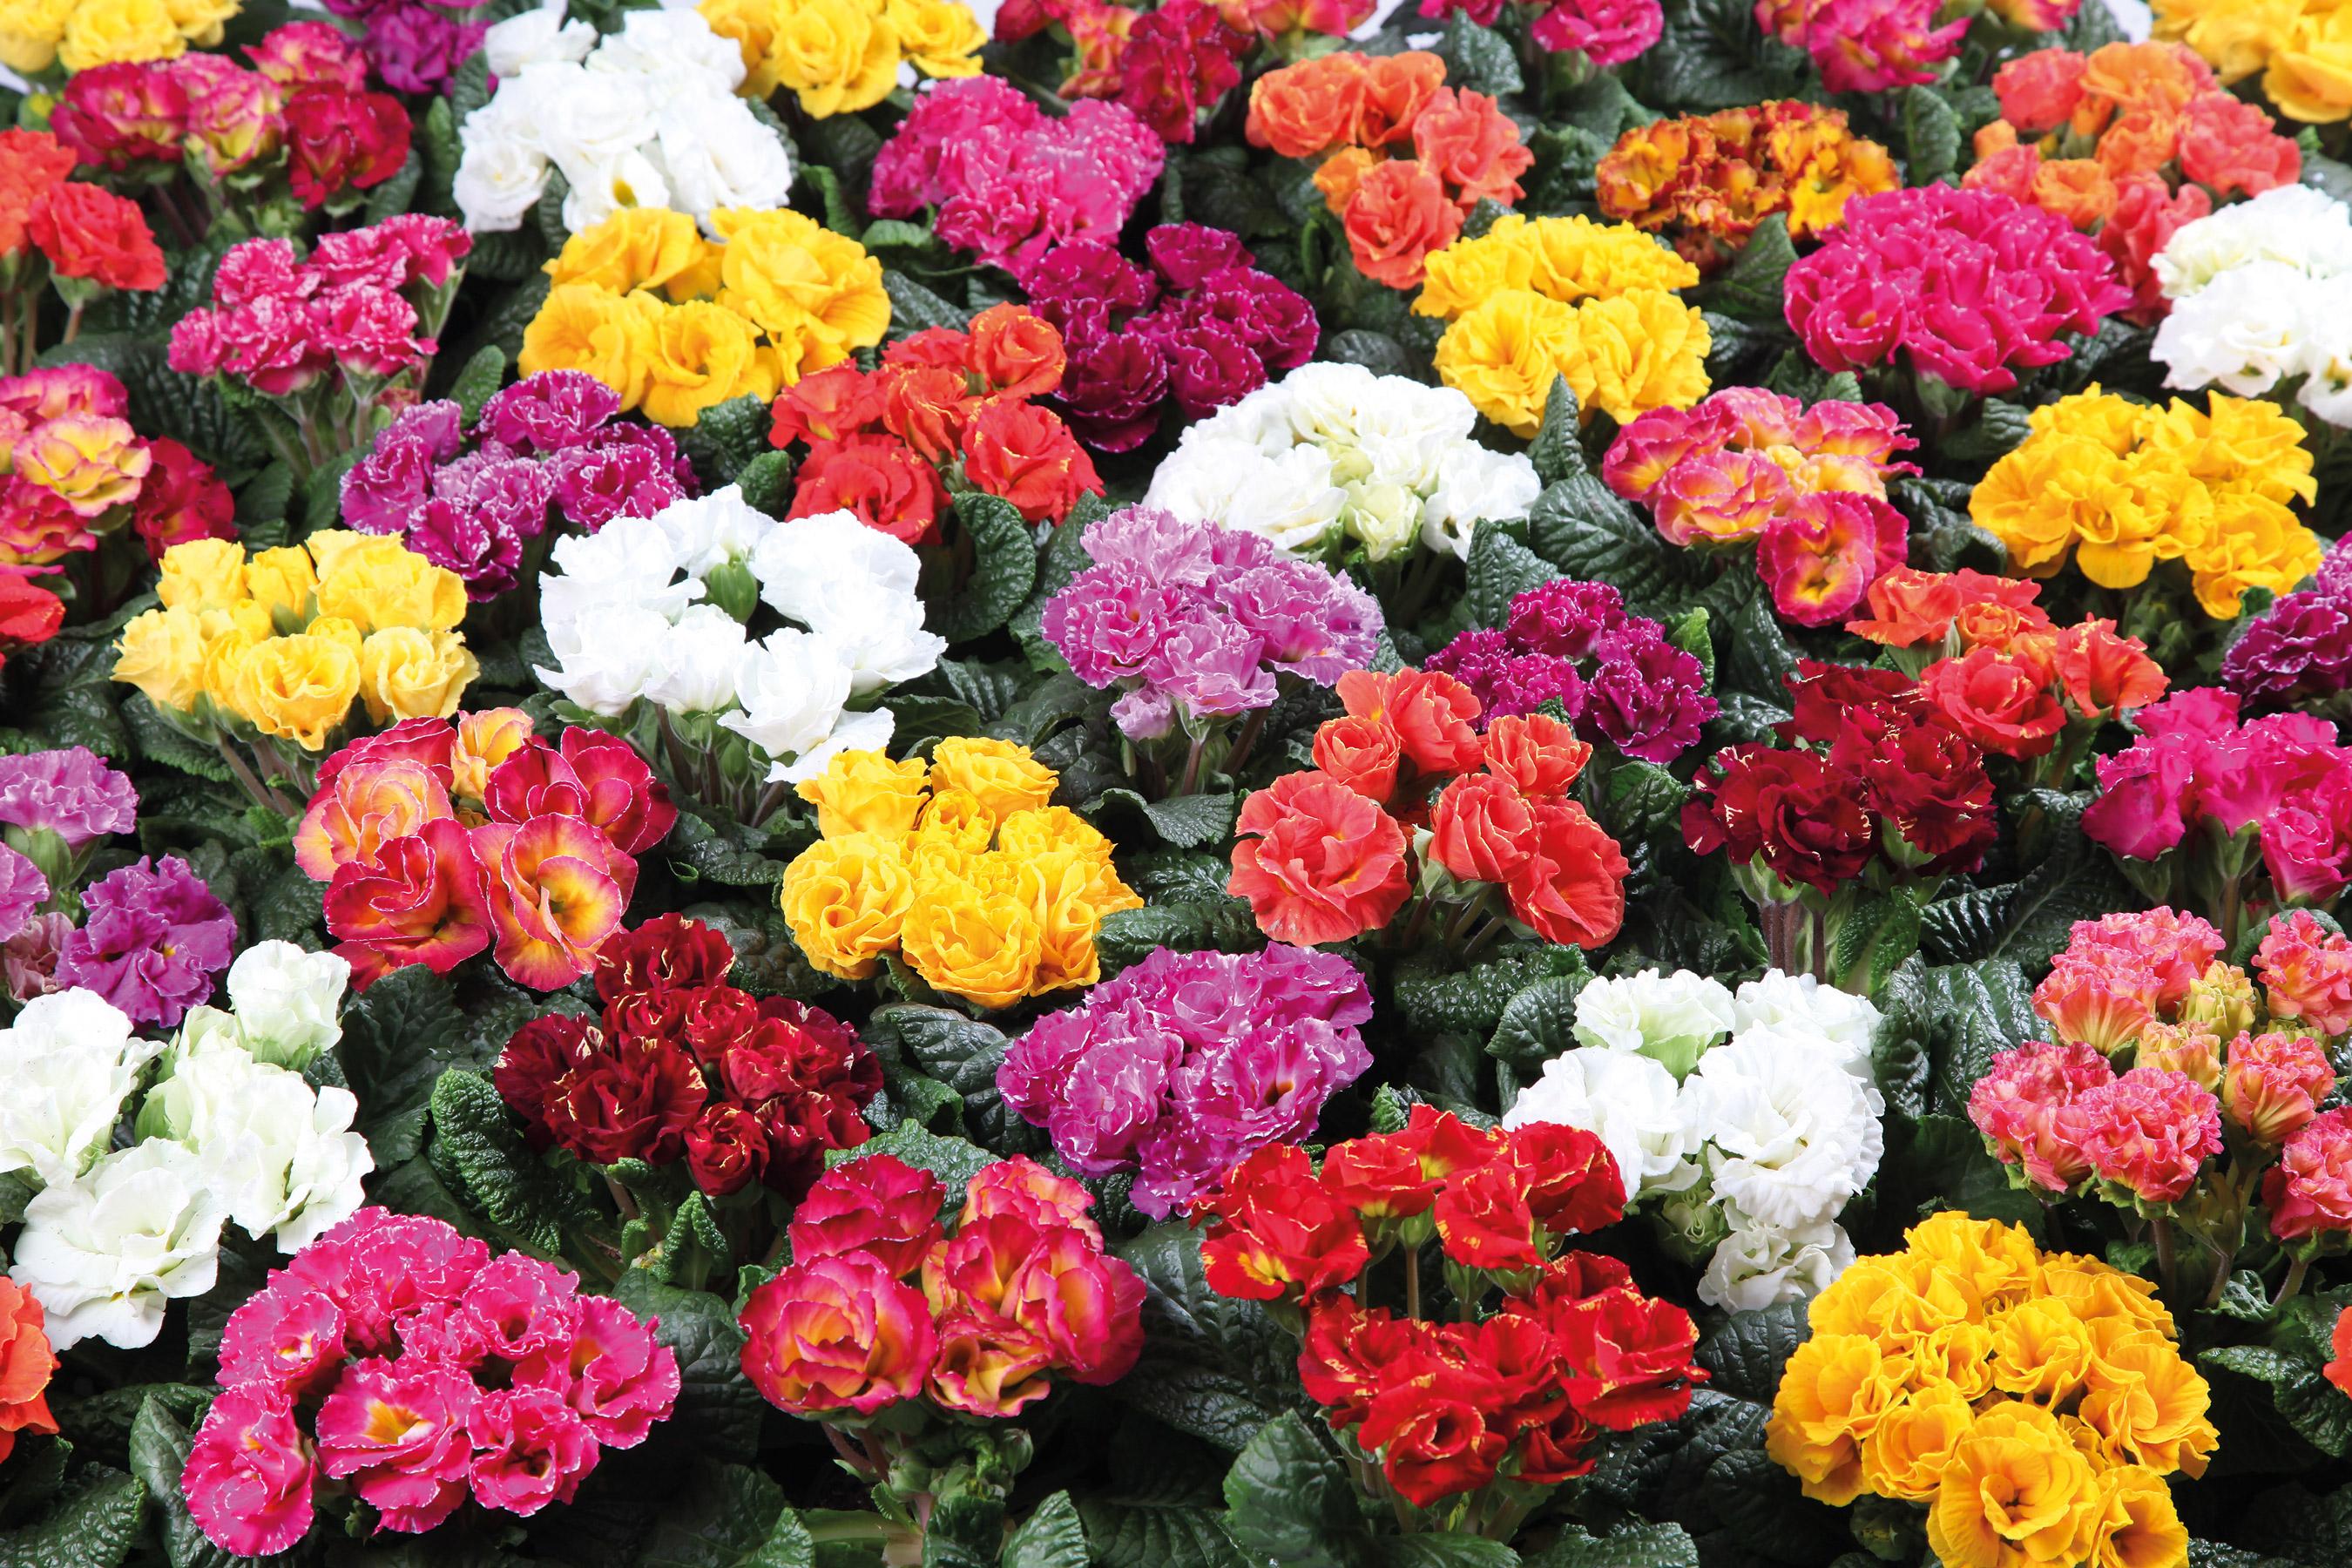 DIVA / MITTELFRÜH – gefüllt blühend, kräftige Farben